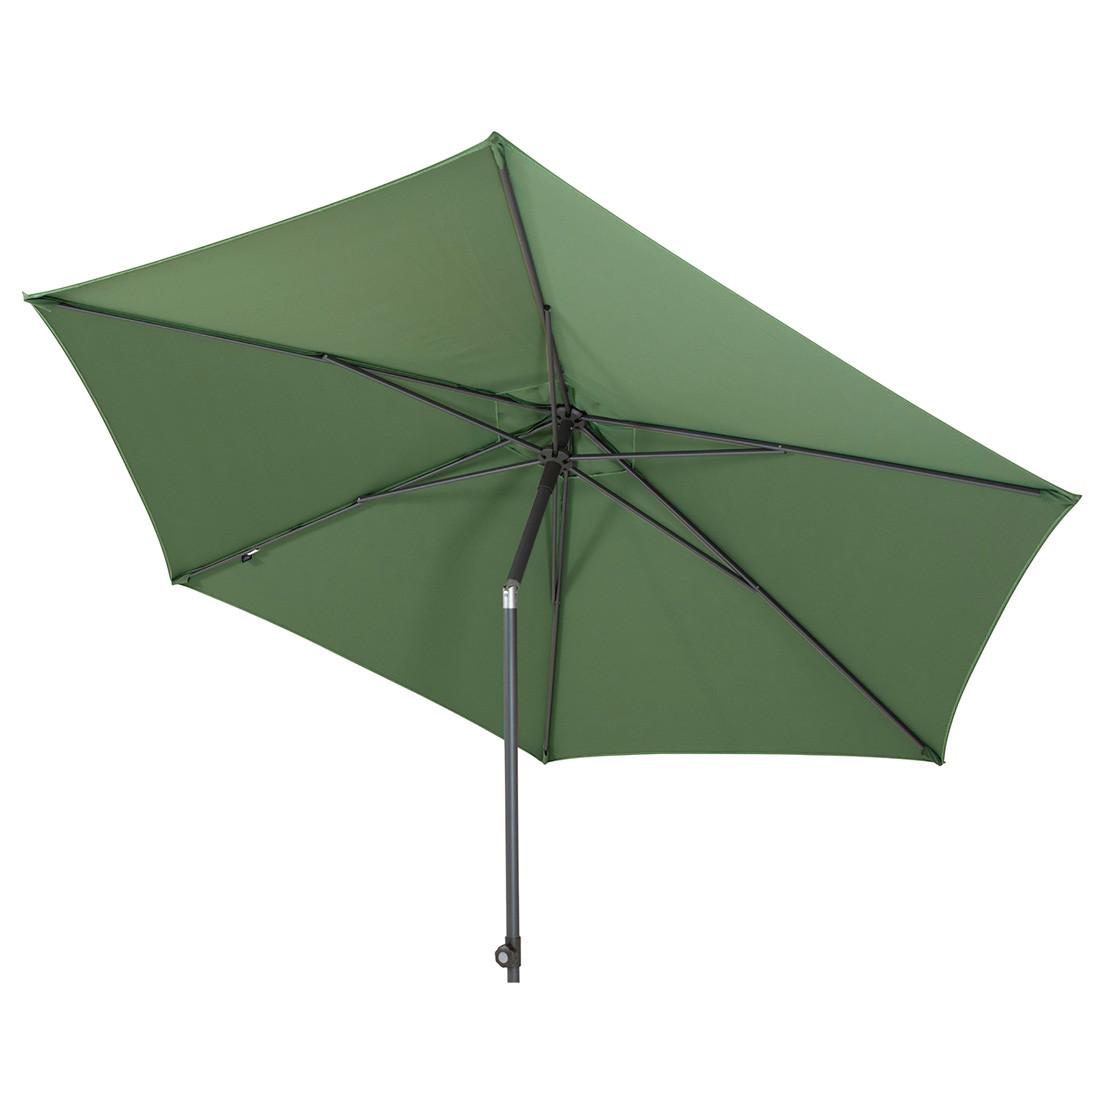 Oasis 250 cm Ø Green